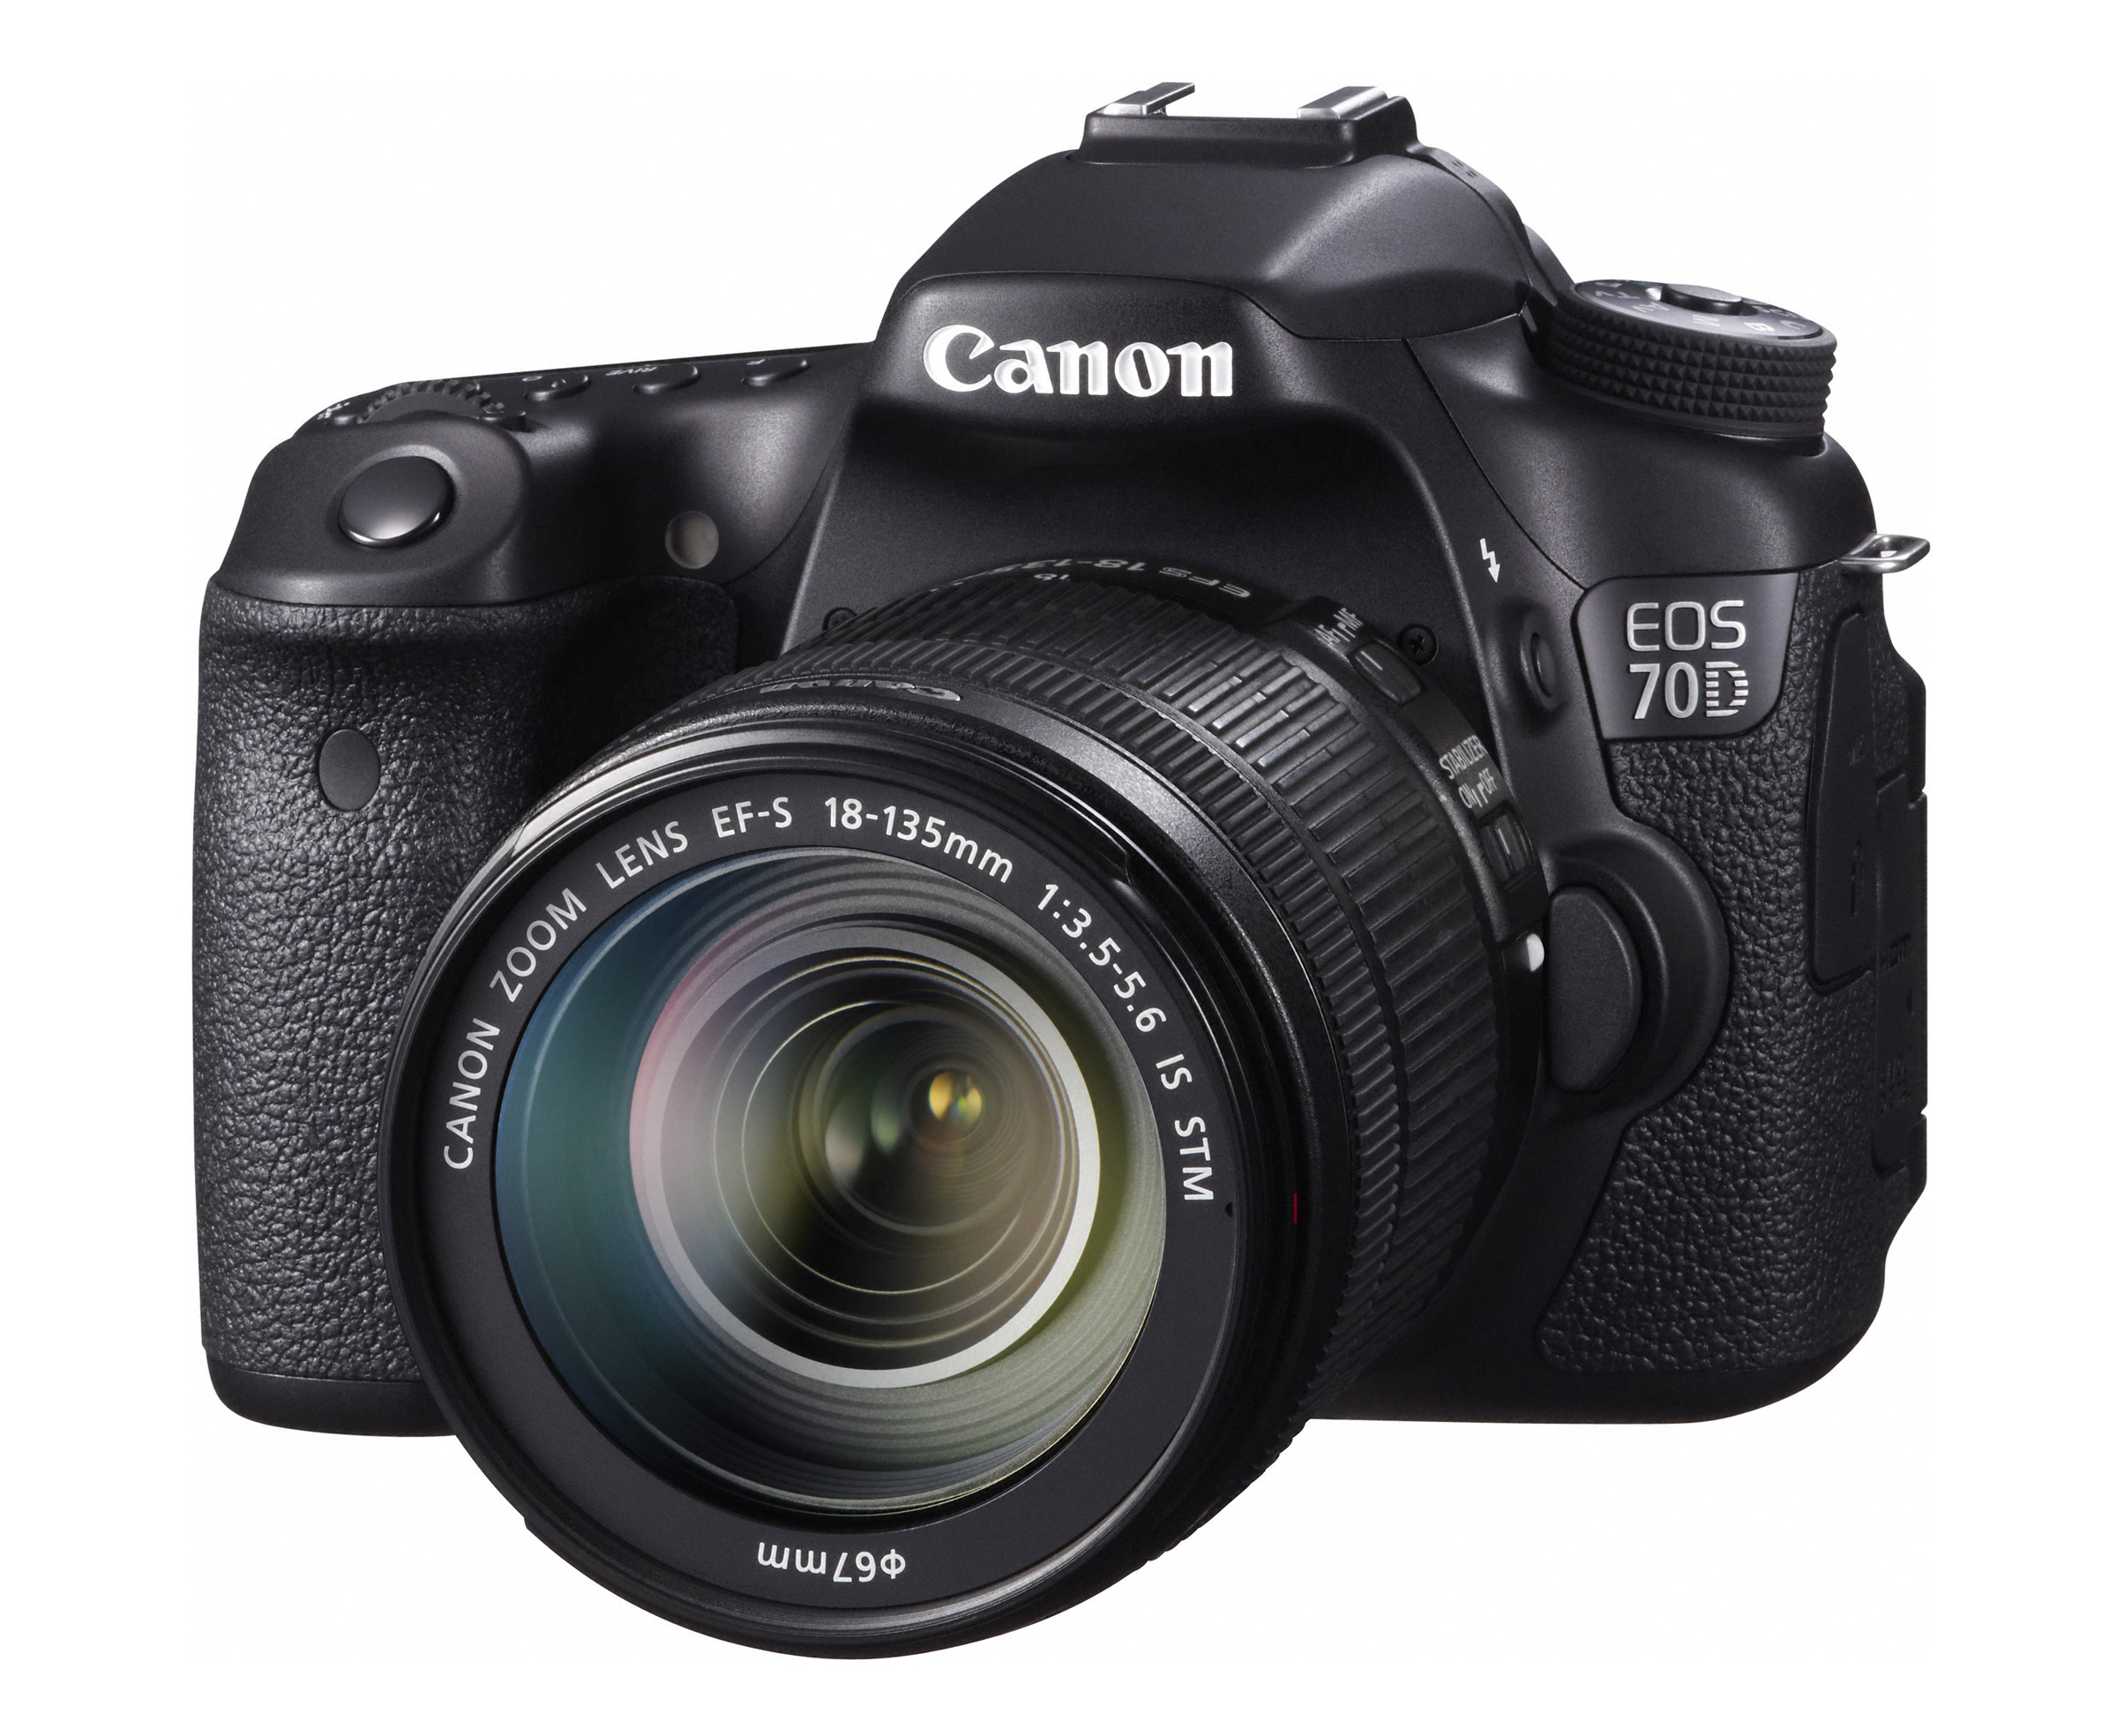 Best camera for ebay photos 2012 DIY motorized camera slider ClickGlide